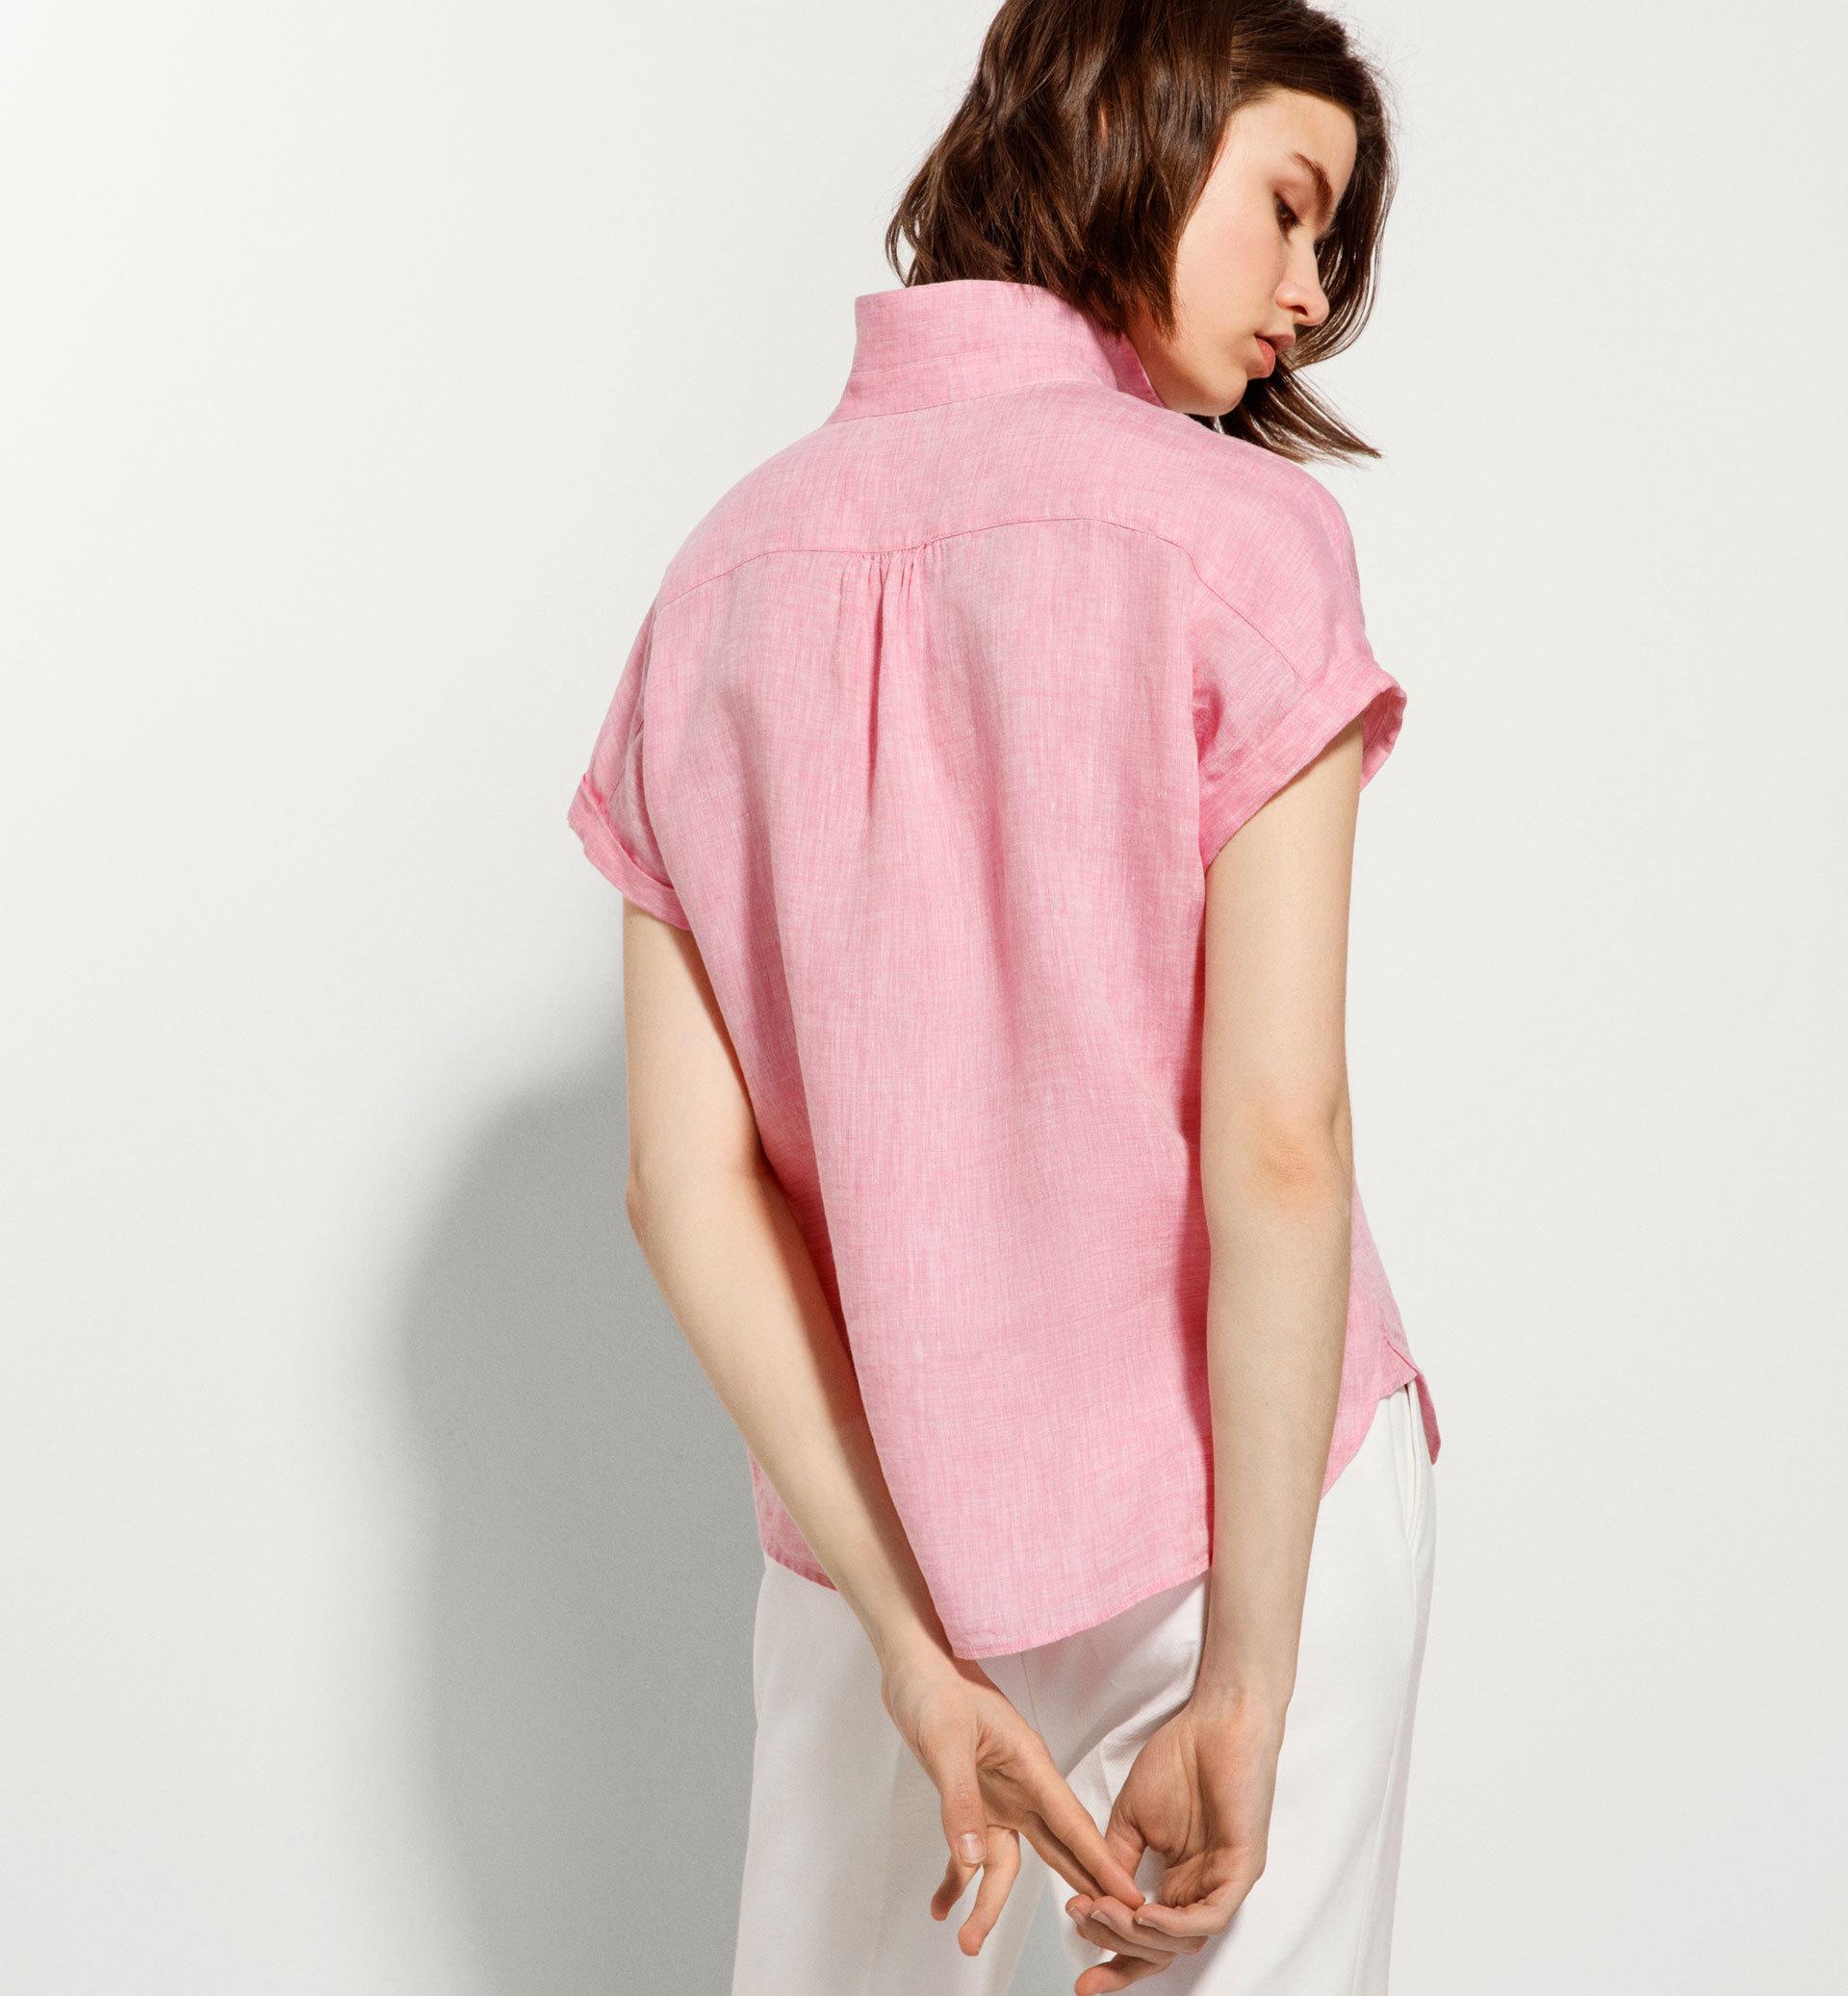 Massimo Dutti short sleeve linen blouse all 5100 / 598